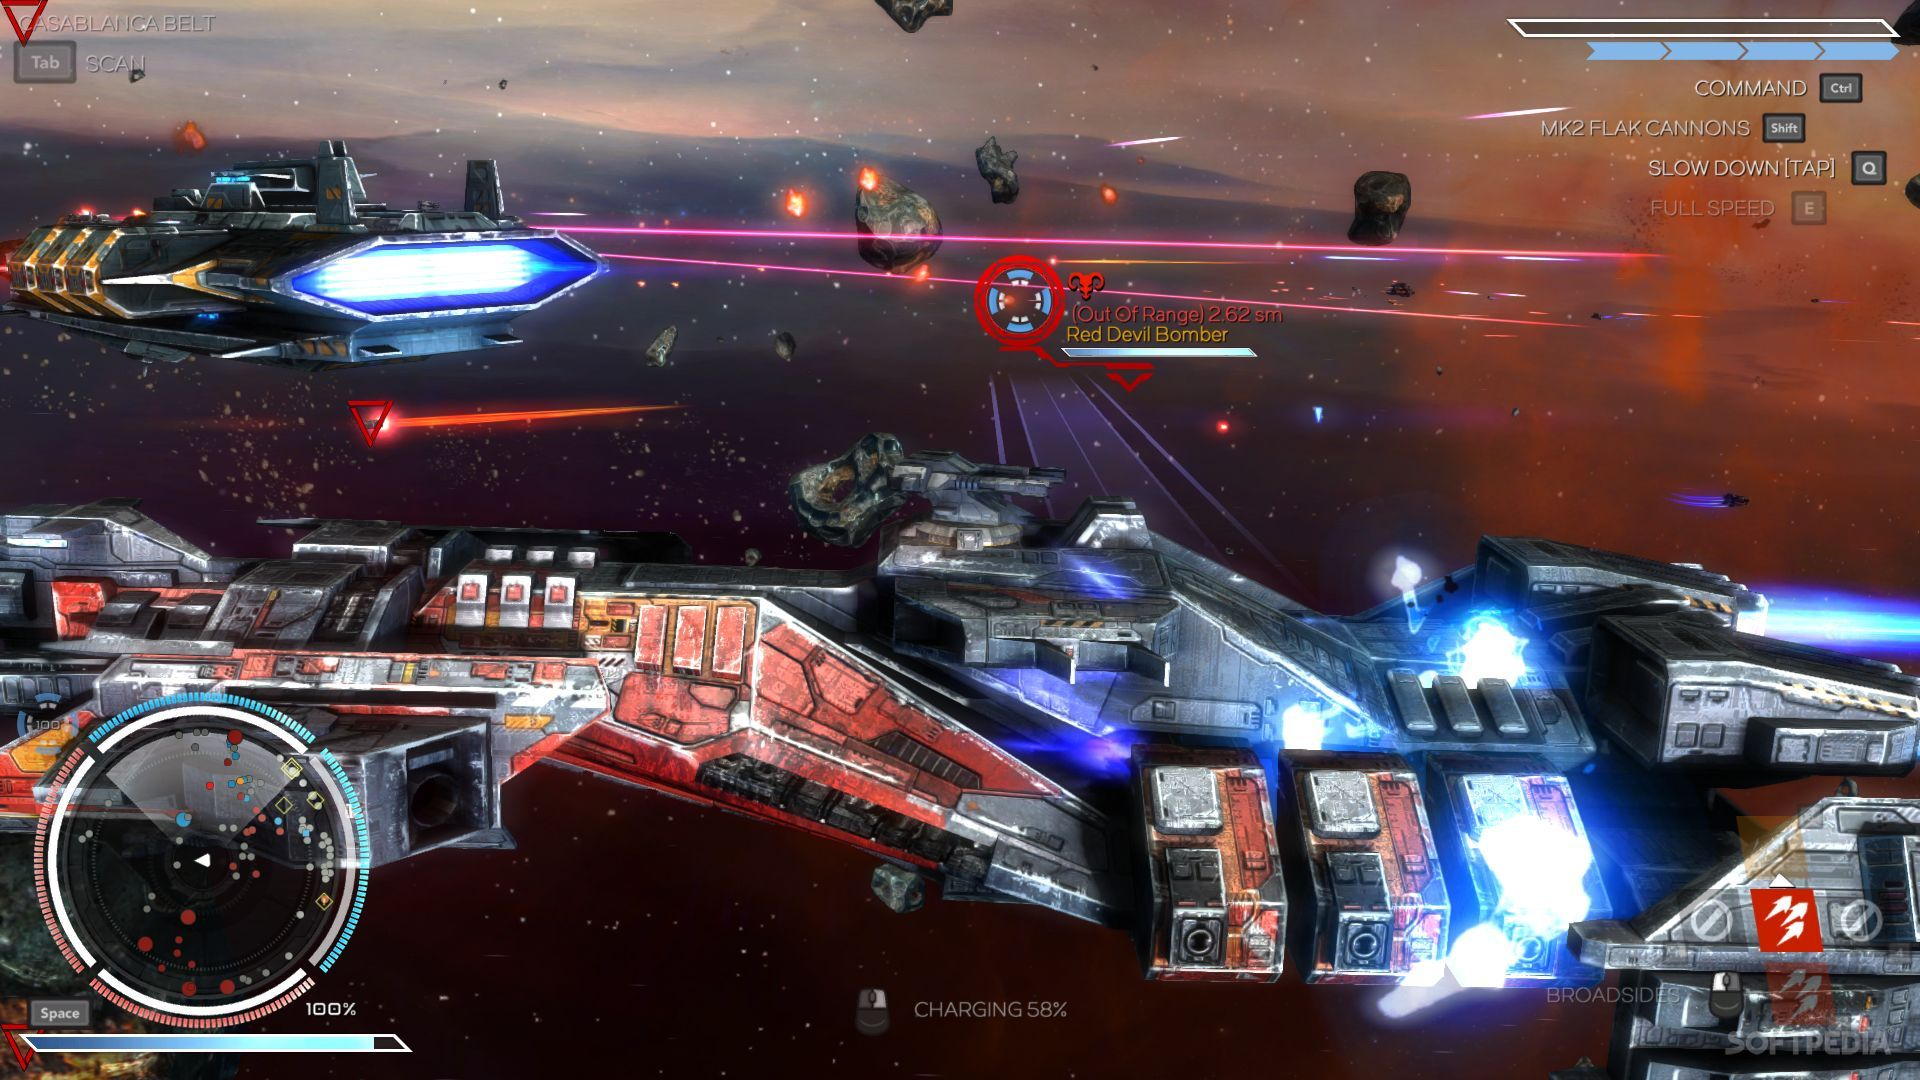 rebel-galaxy-review-pc-494858-23.jpg